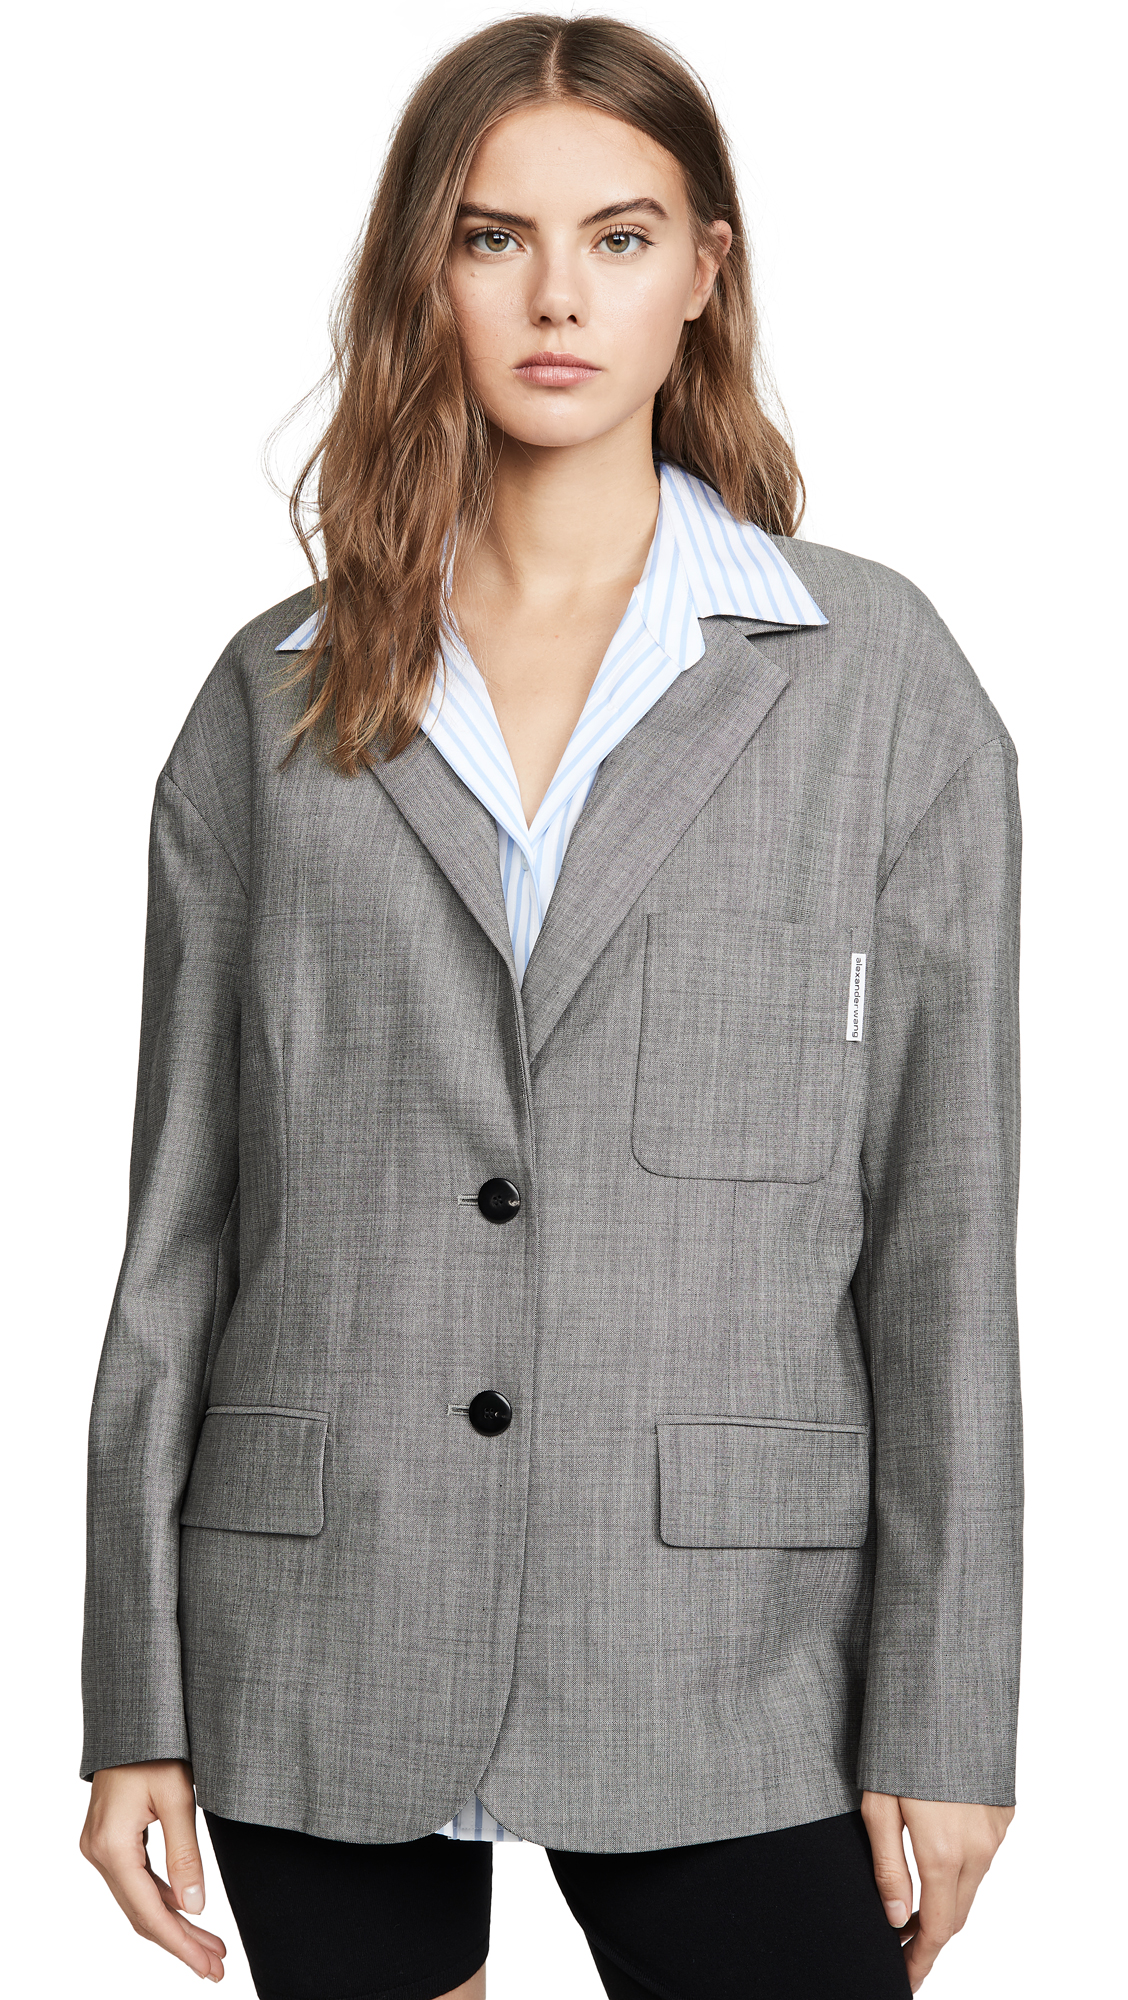 Alexander Wang Mohair Blazer with Poplin Shirt - Grey